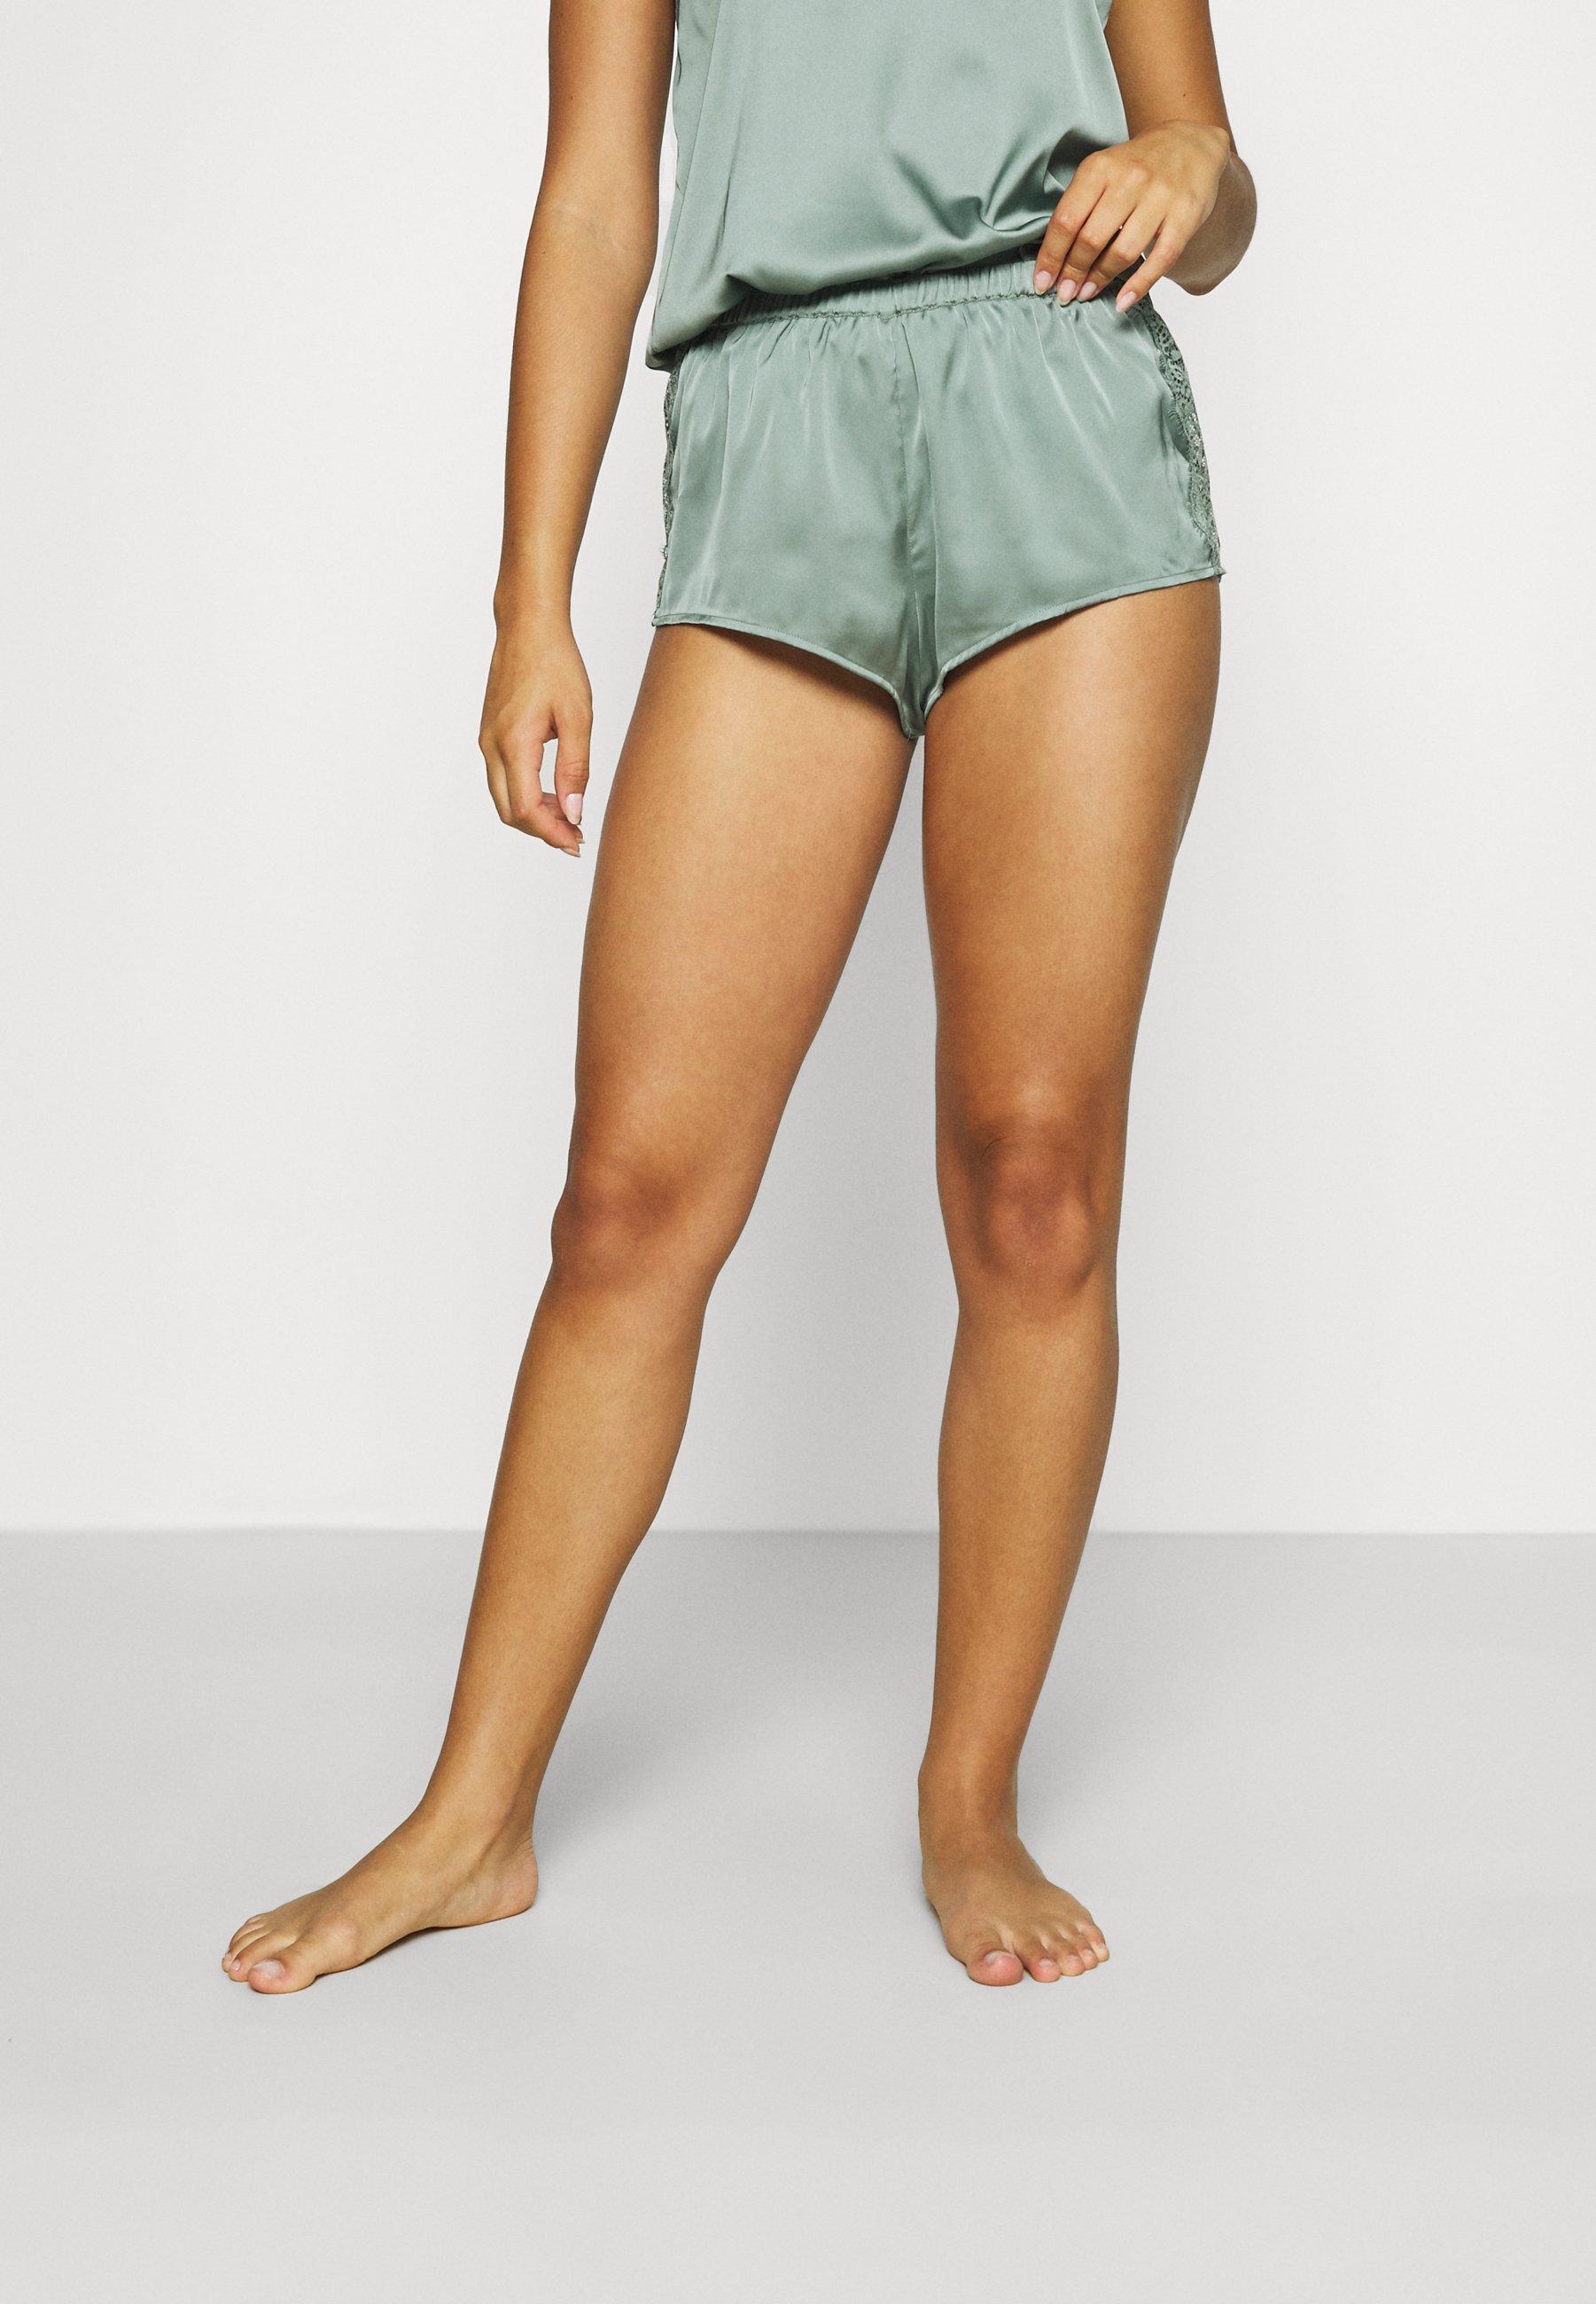 Femme SECRETS NIGHT SHORT - Bas de pyjama